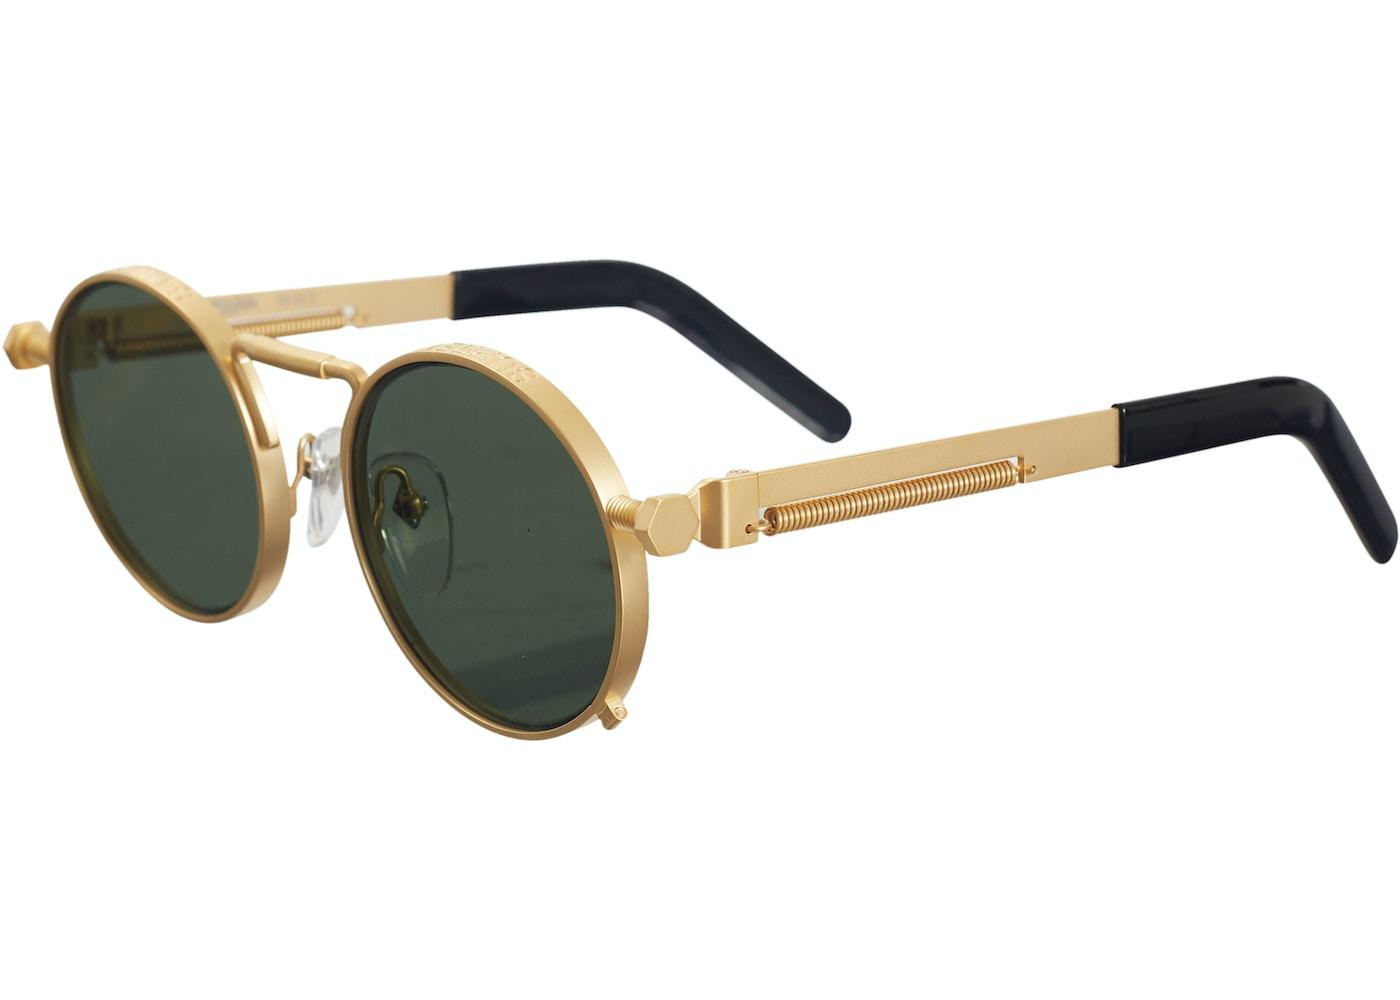 1c1dbcb6334 Supreme Jean Paul Gaultier Sunglasses Gold - SS19